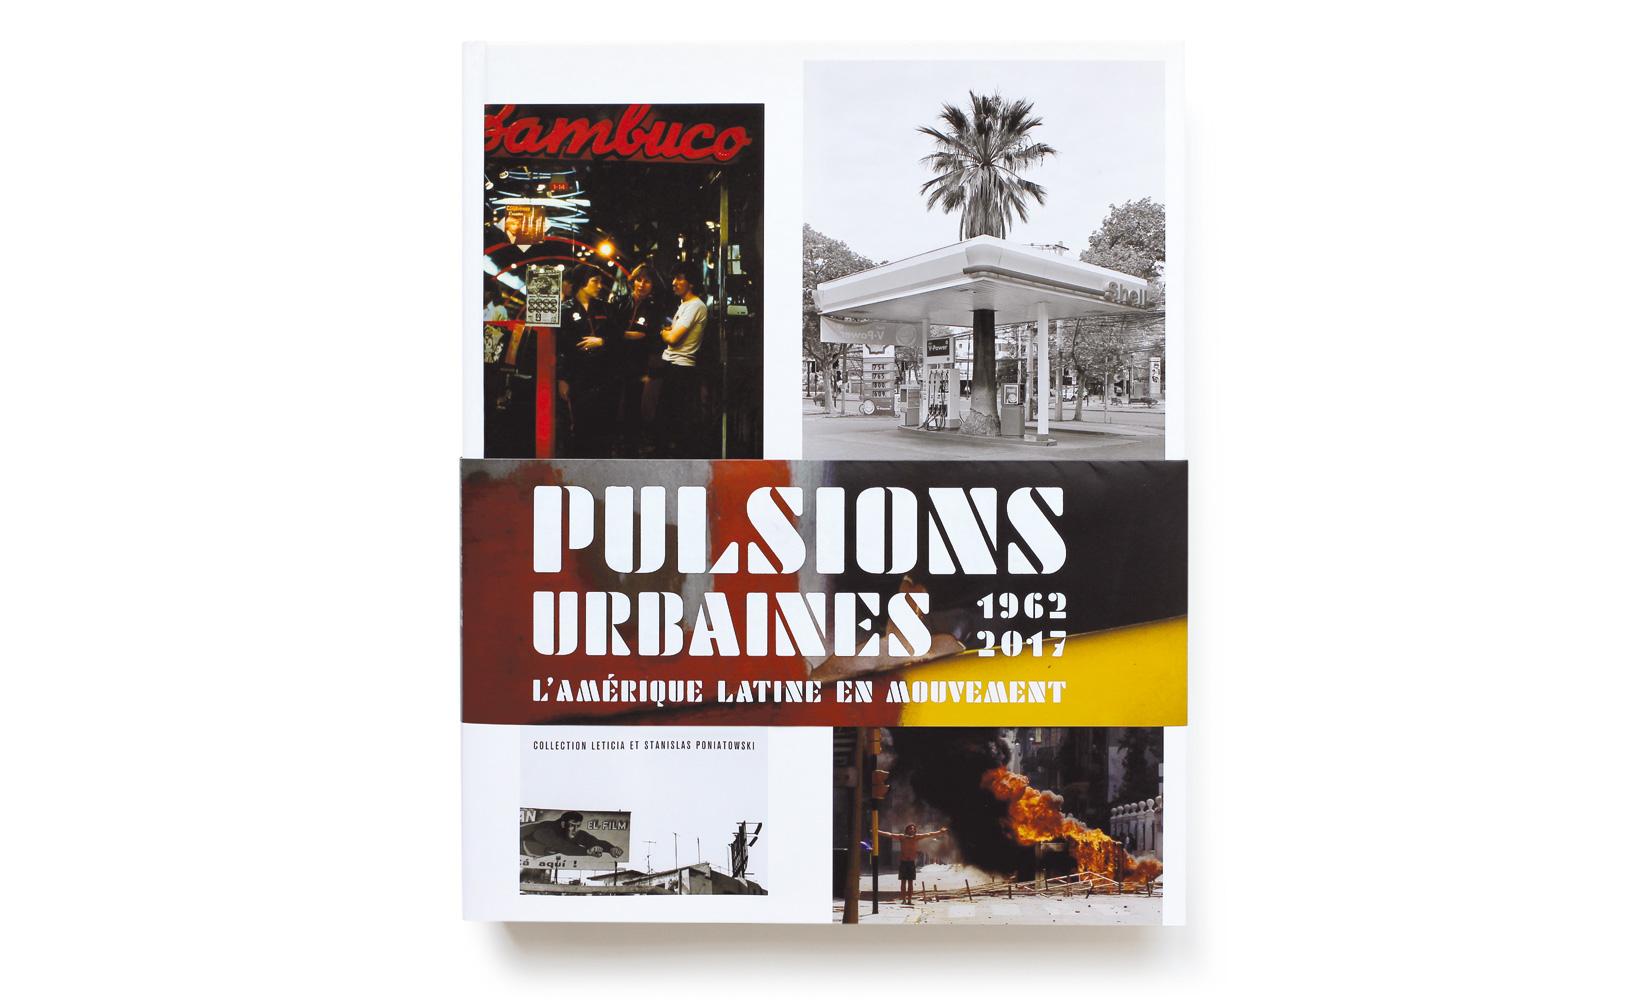 olivier-andreotti-pulsions-urbaines-01.jpg